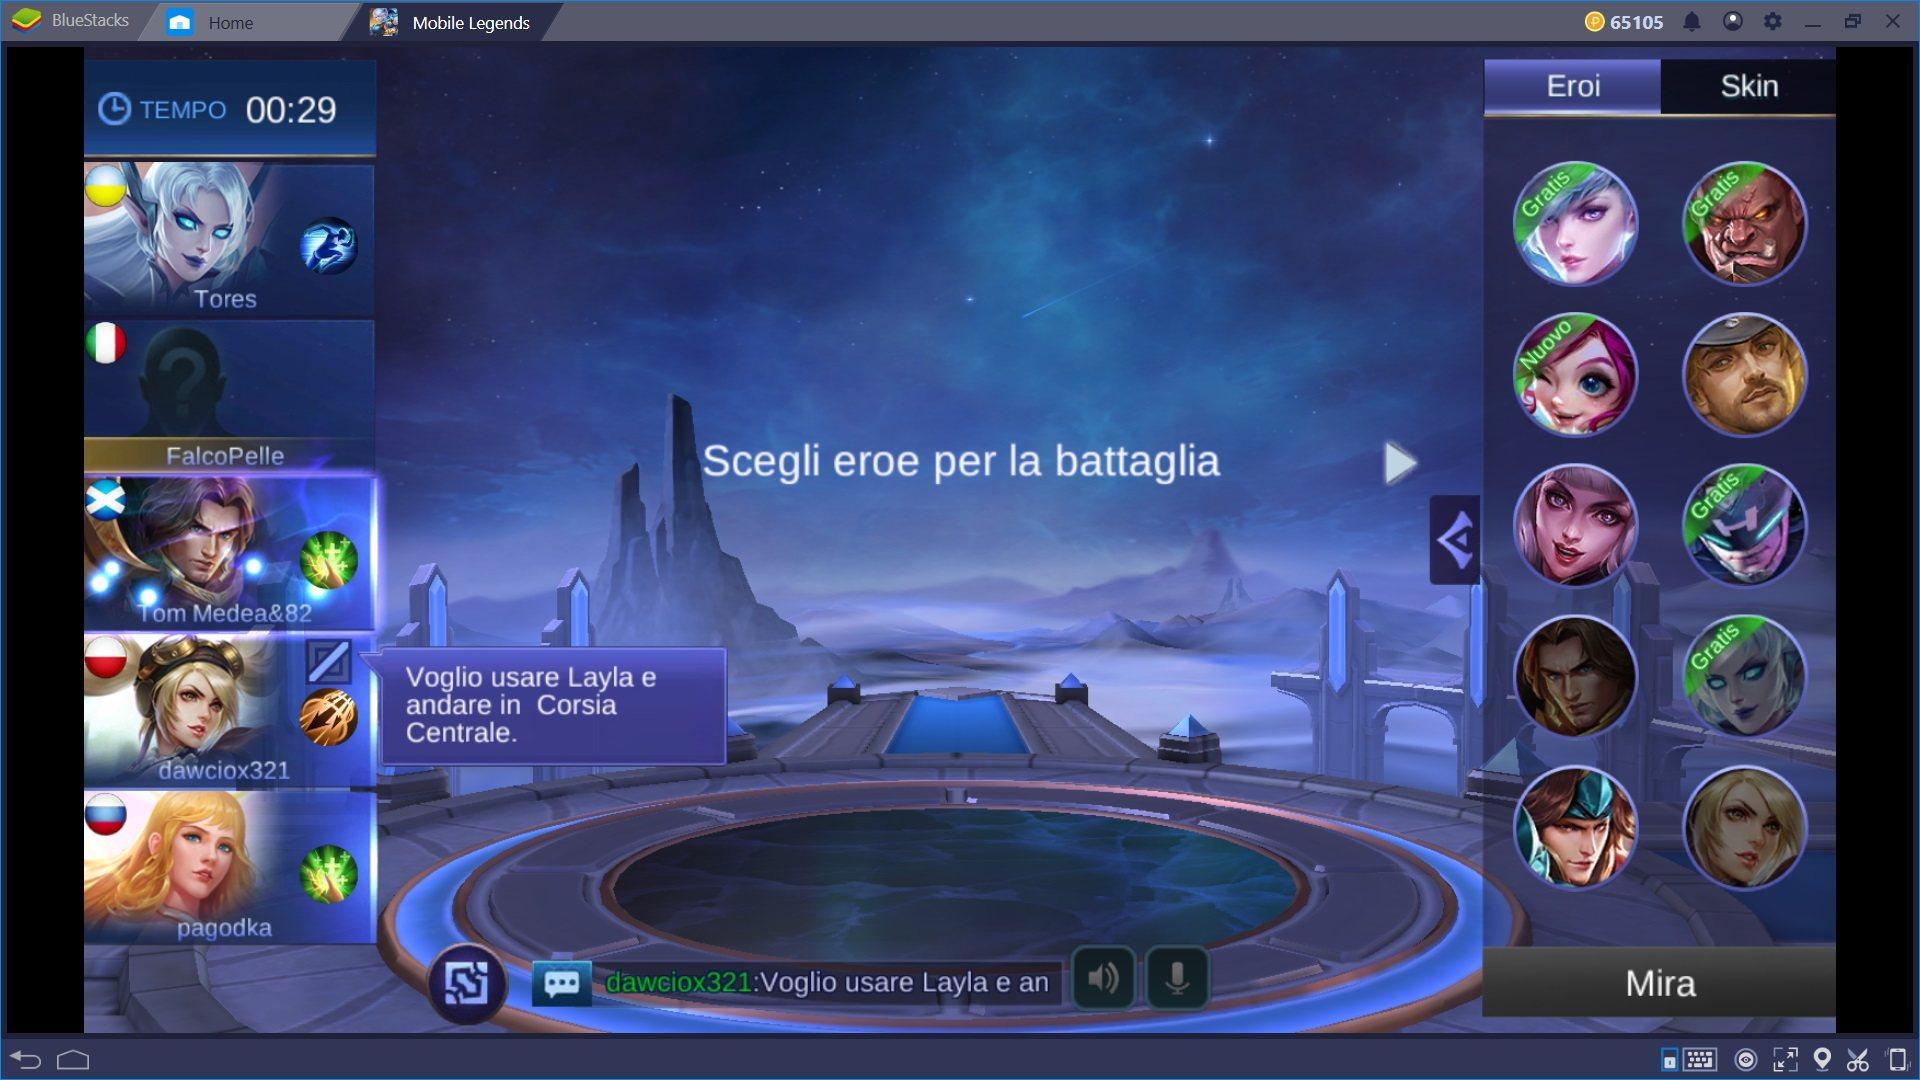 Trucchi e Consigli per Mobile Legends: Bang Bang